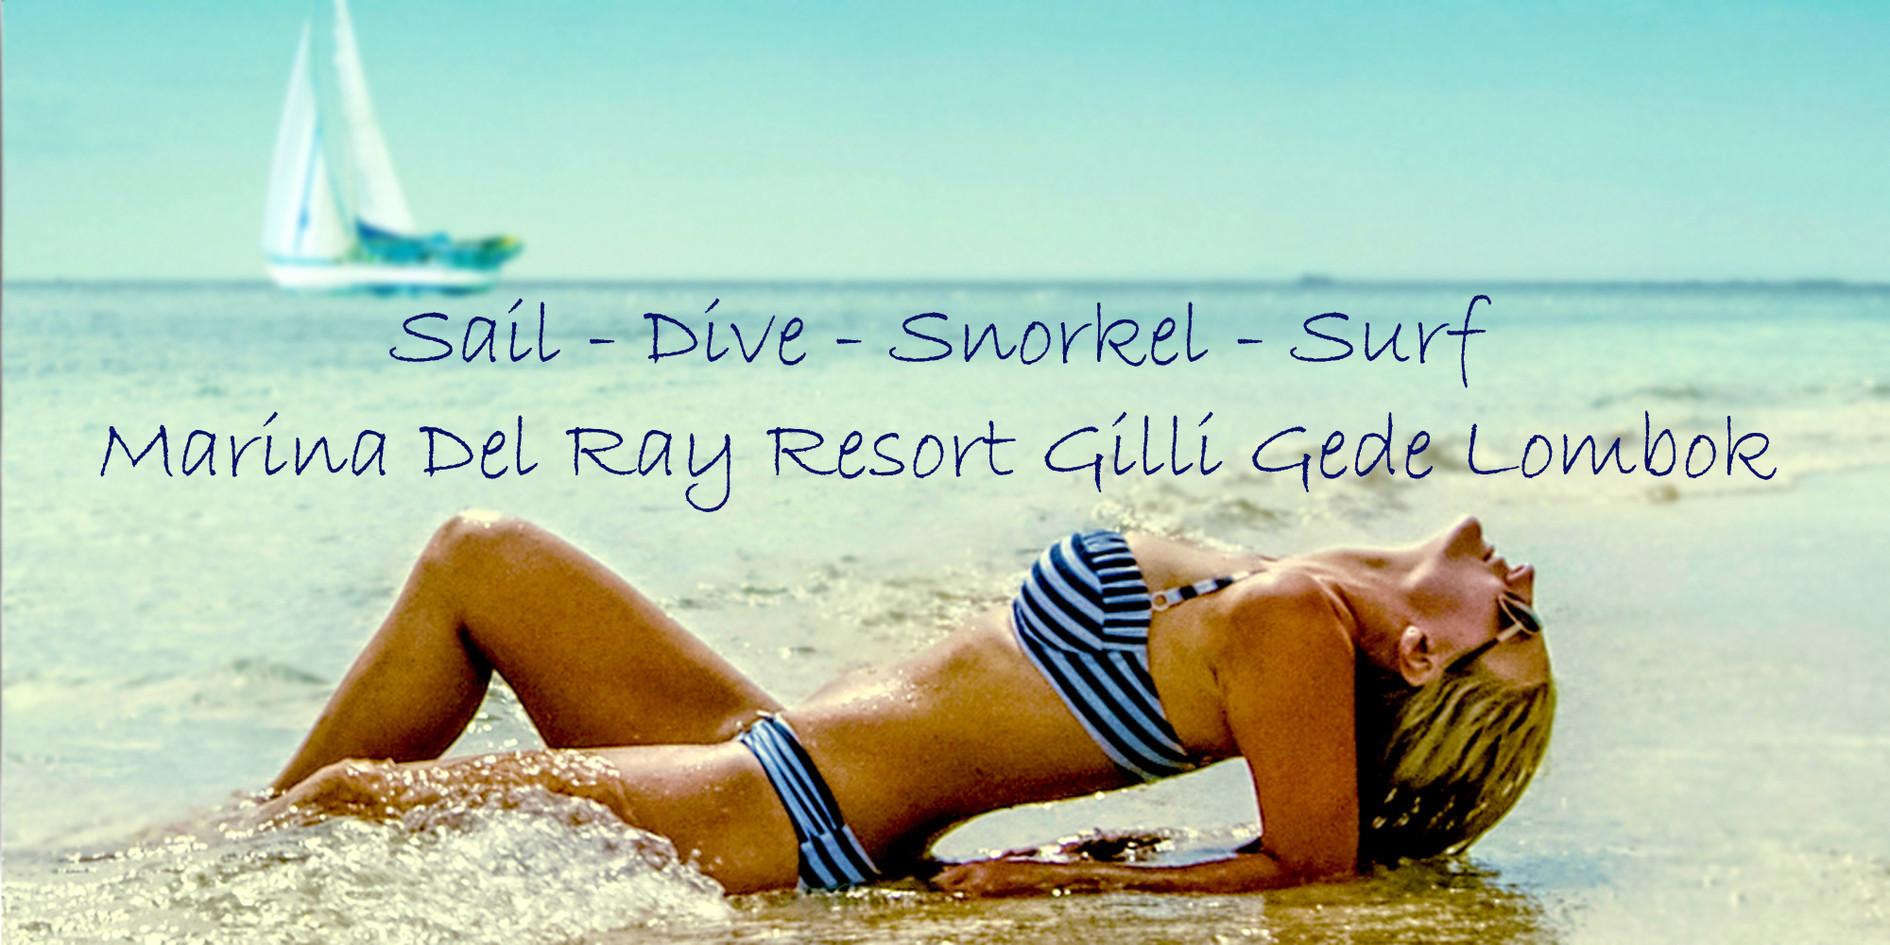 Marina Del Ray Resort Sail 1.jpg